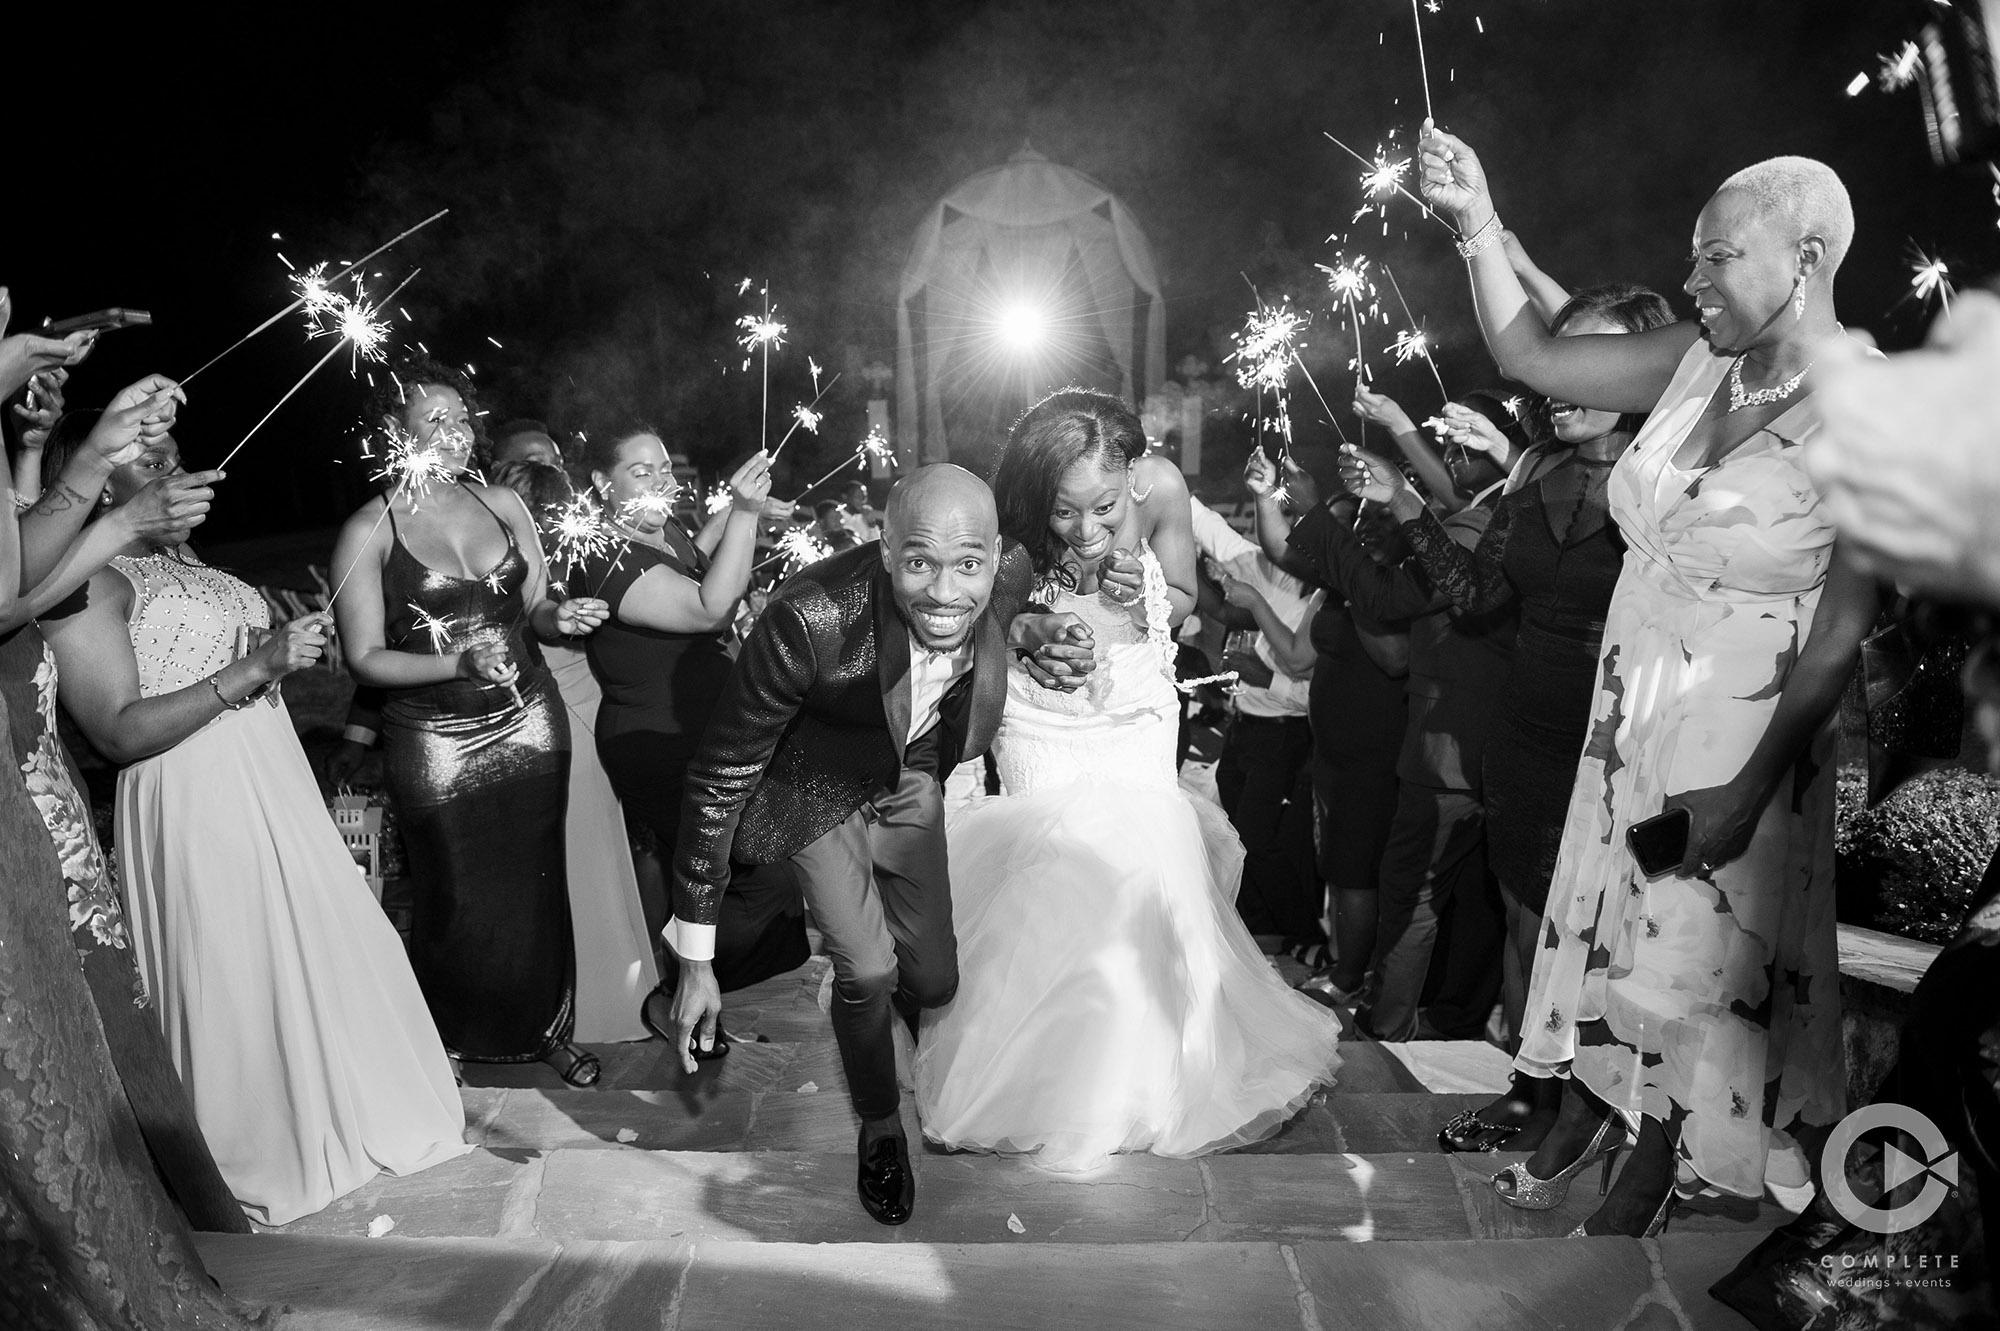 Complete Weddings + Events - Marietta, GA 30066 - (770)425-3535 | ShowMeLocal.com